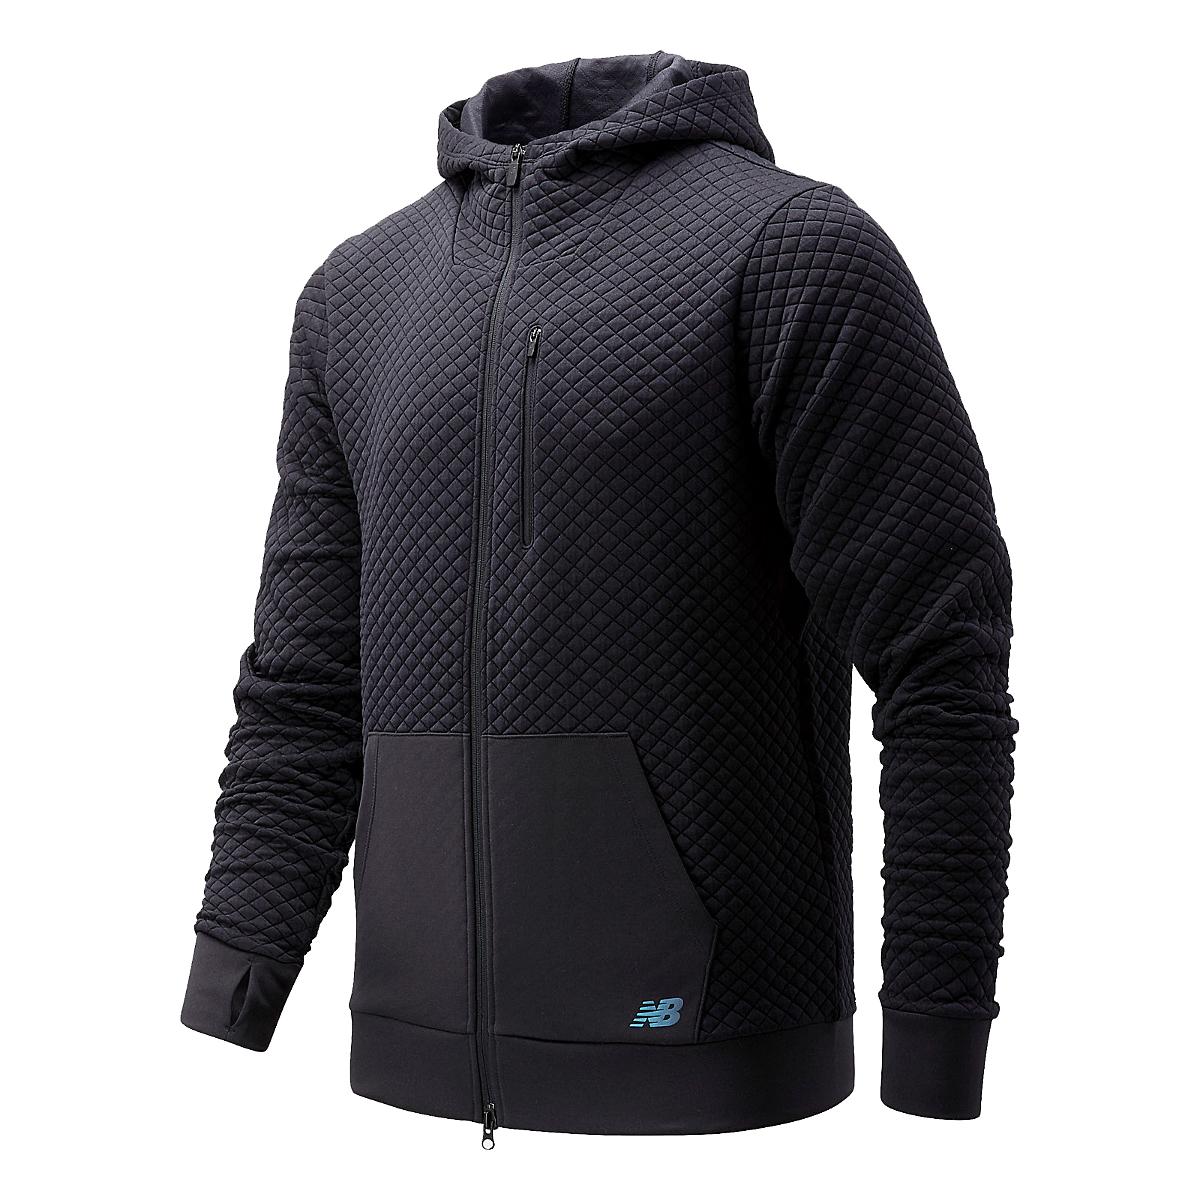 Men's New Balance Heatloft Full Zip - Color: Black - Size: S, Black, large, image 1